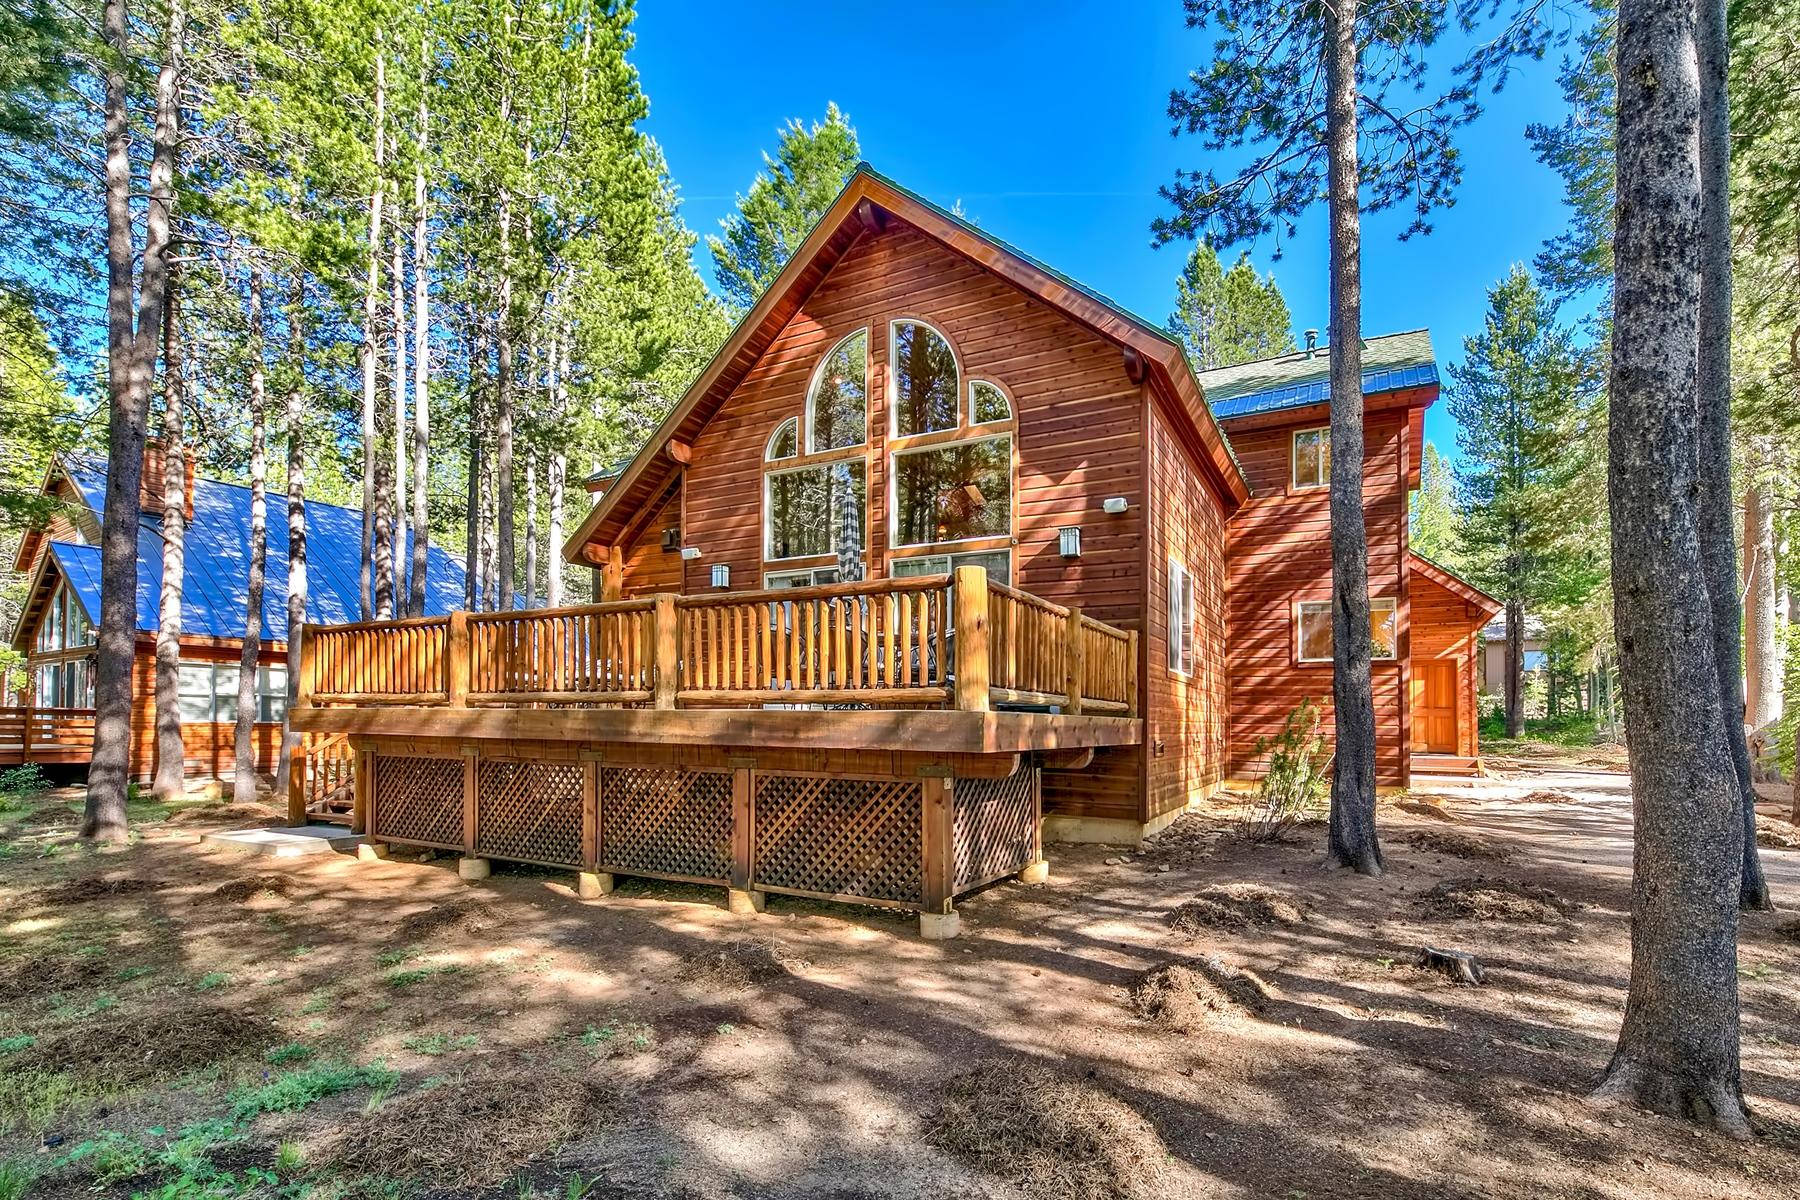 Additional photo for property listing at 14508 Davos Drive, Truckee, CA 14508 Davos Dr. Truckee, California 96161 Estados Unidos